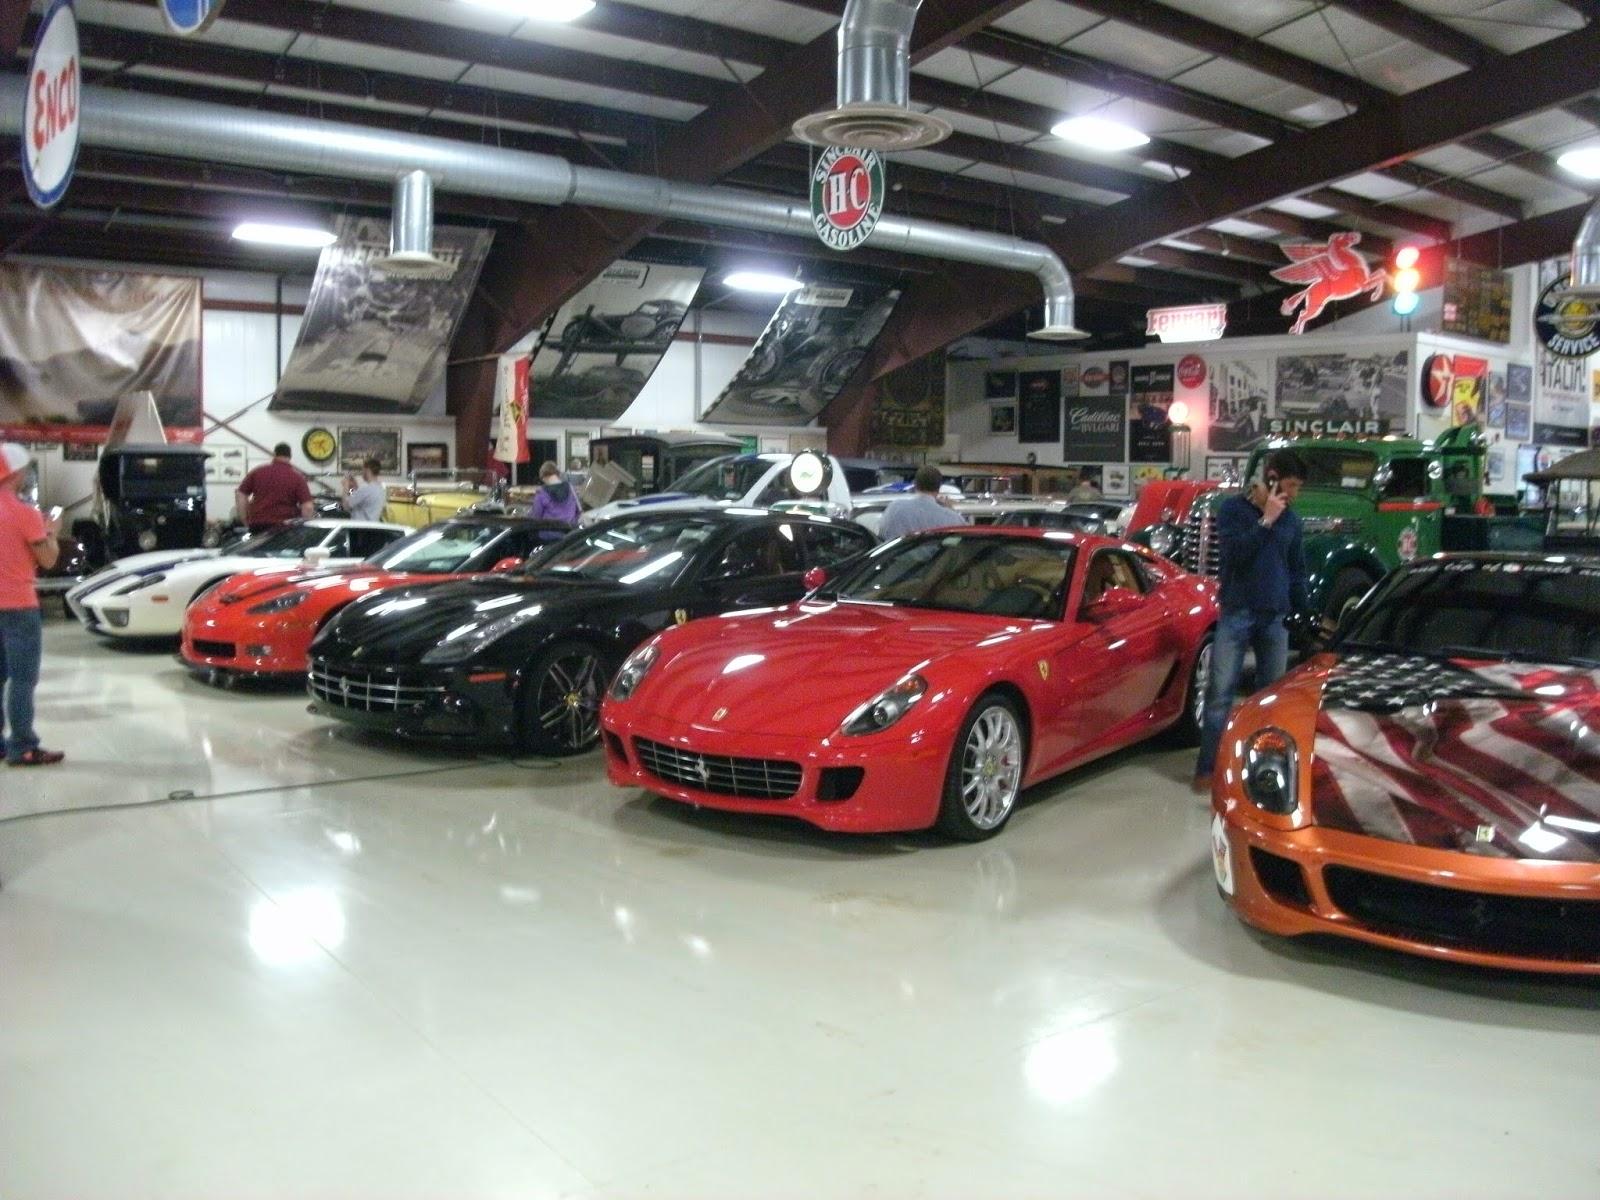 Luxury caravan with full size sports car garage from futuria - An Ac Pre Cobra